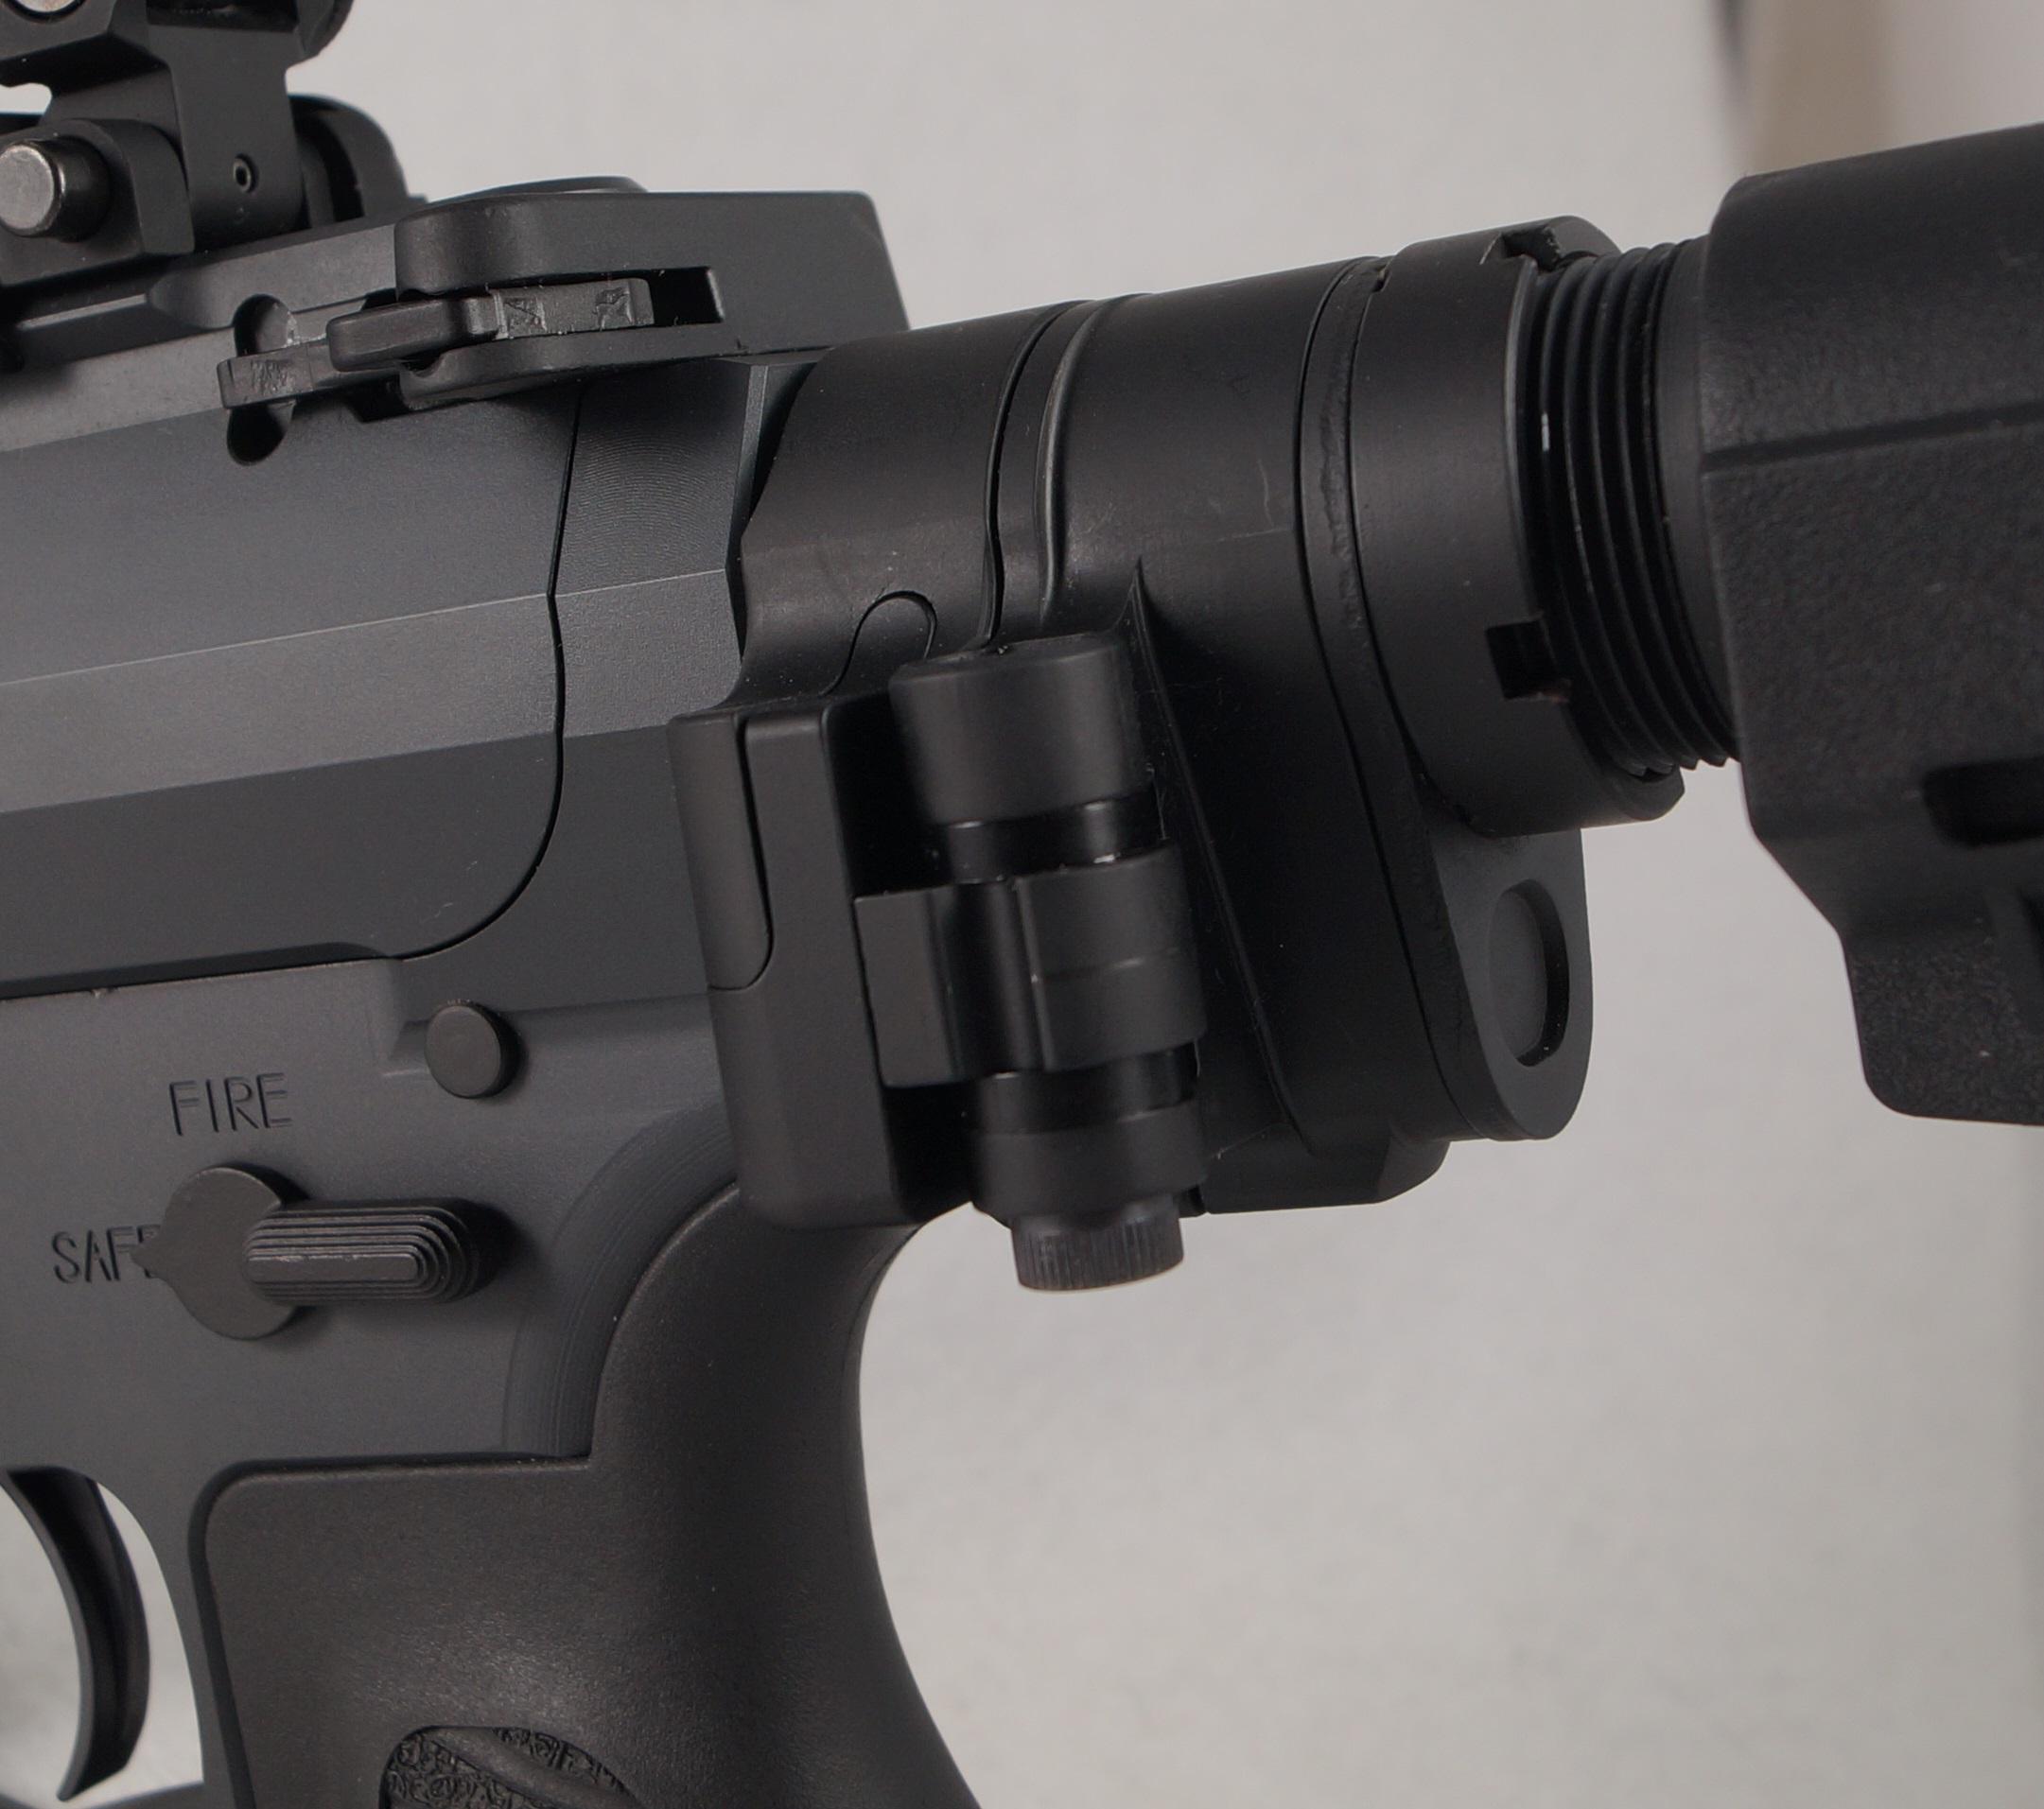 WTS - Wilson Combar AR9 G Pistol - AR15 COM